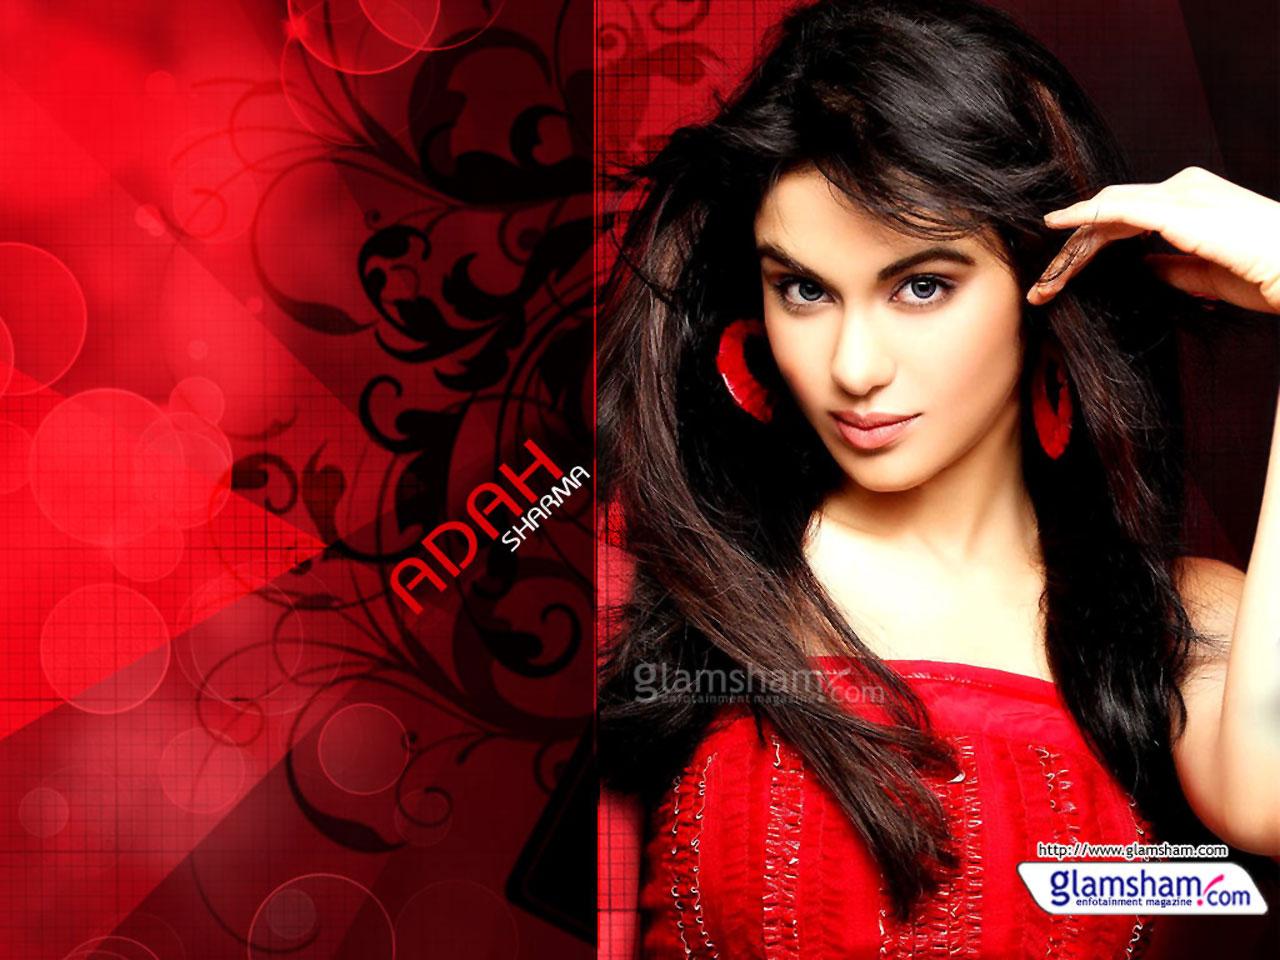 hd wallpapers bollywood actresses hd wallpapers bollywood actresses hd 1280x960